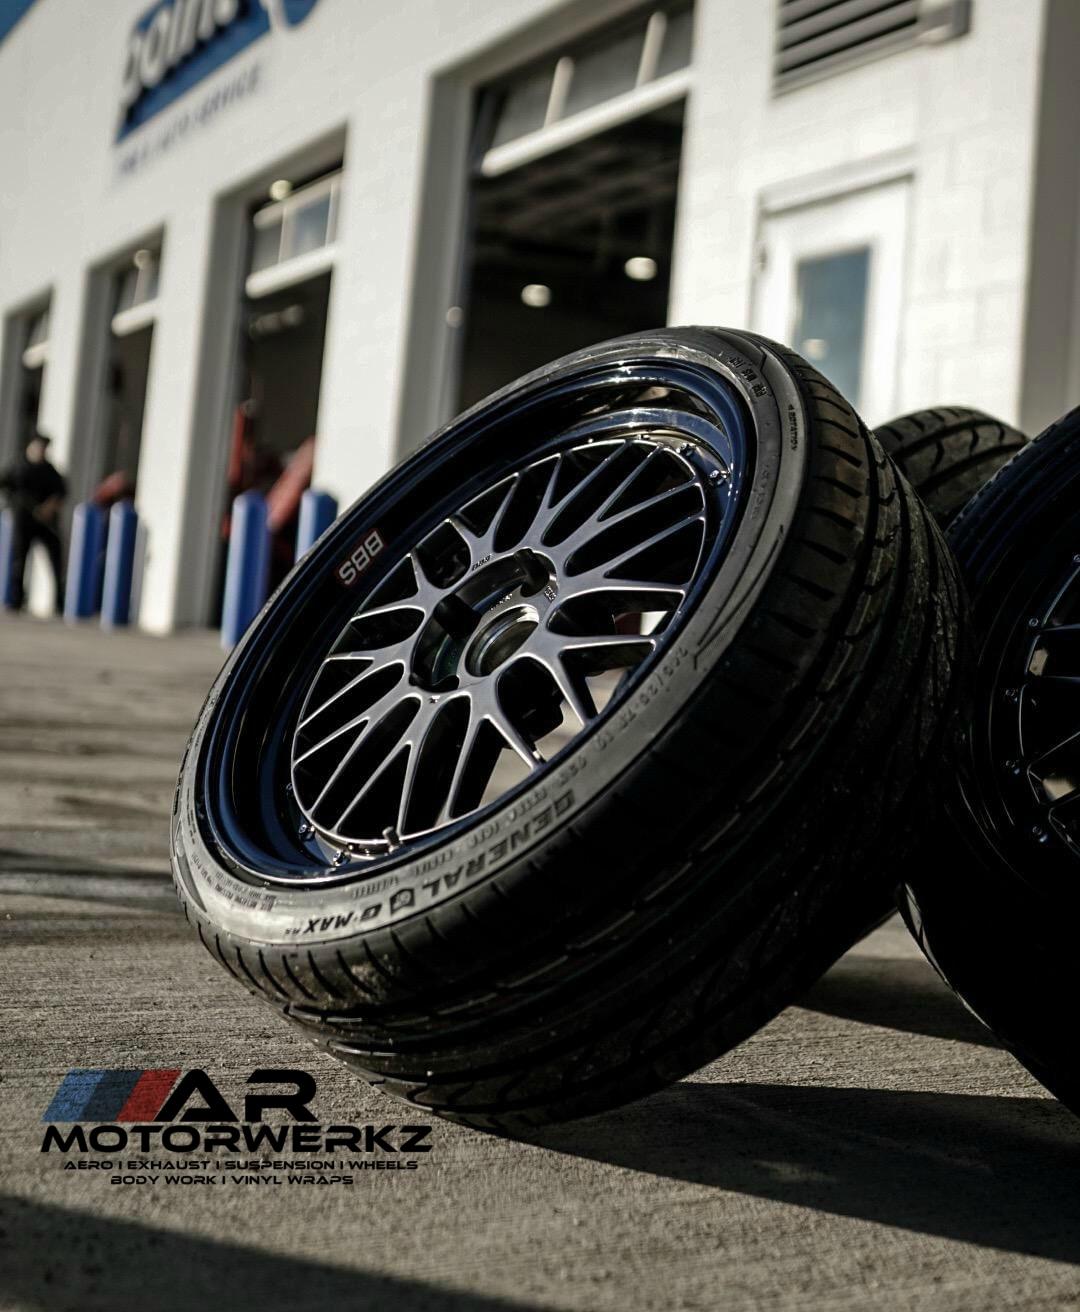 Bbs Wheels L Best Price L 1 Direct Dealer Page 15 6post Com Bmw 6 Series Forum